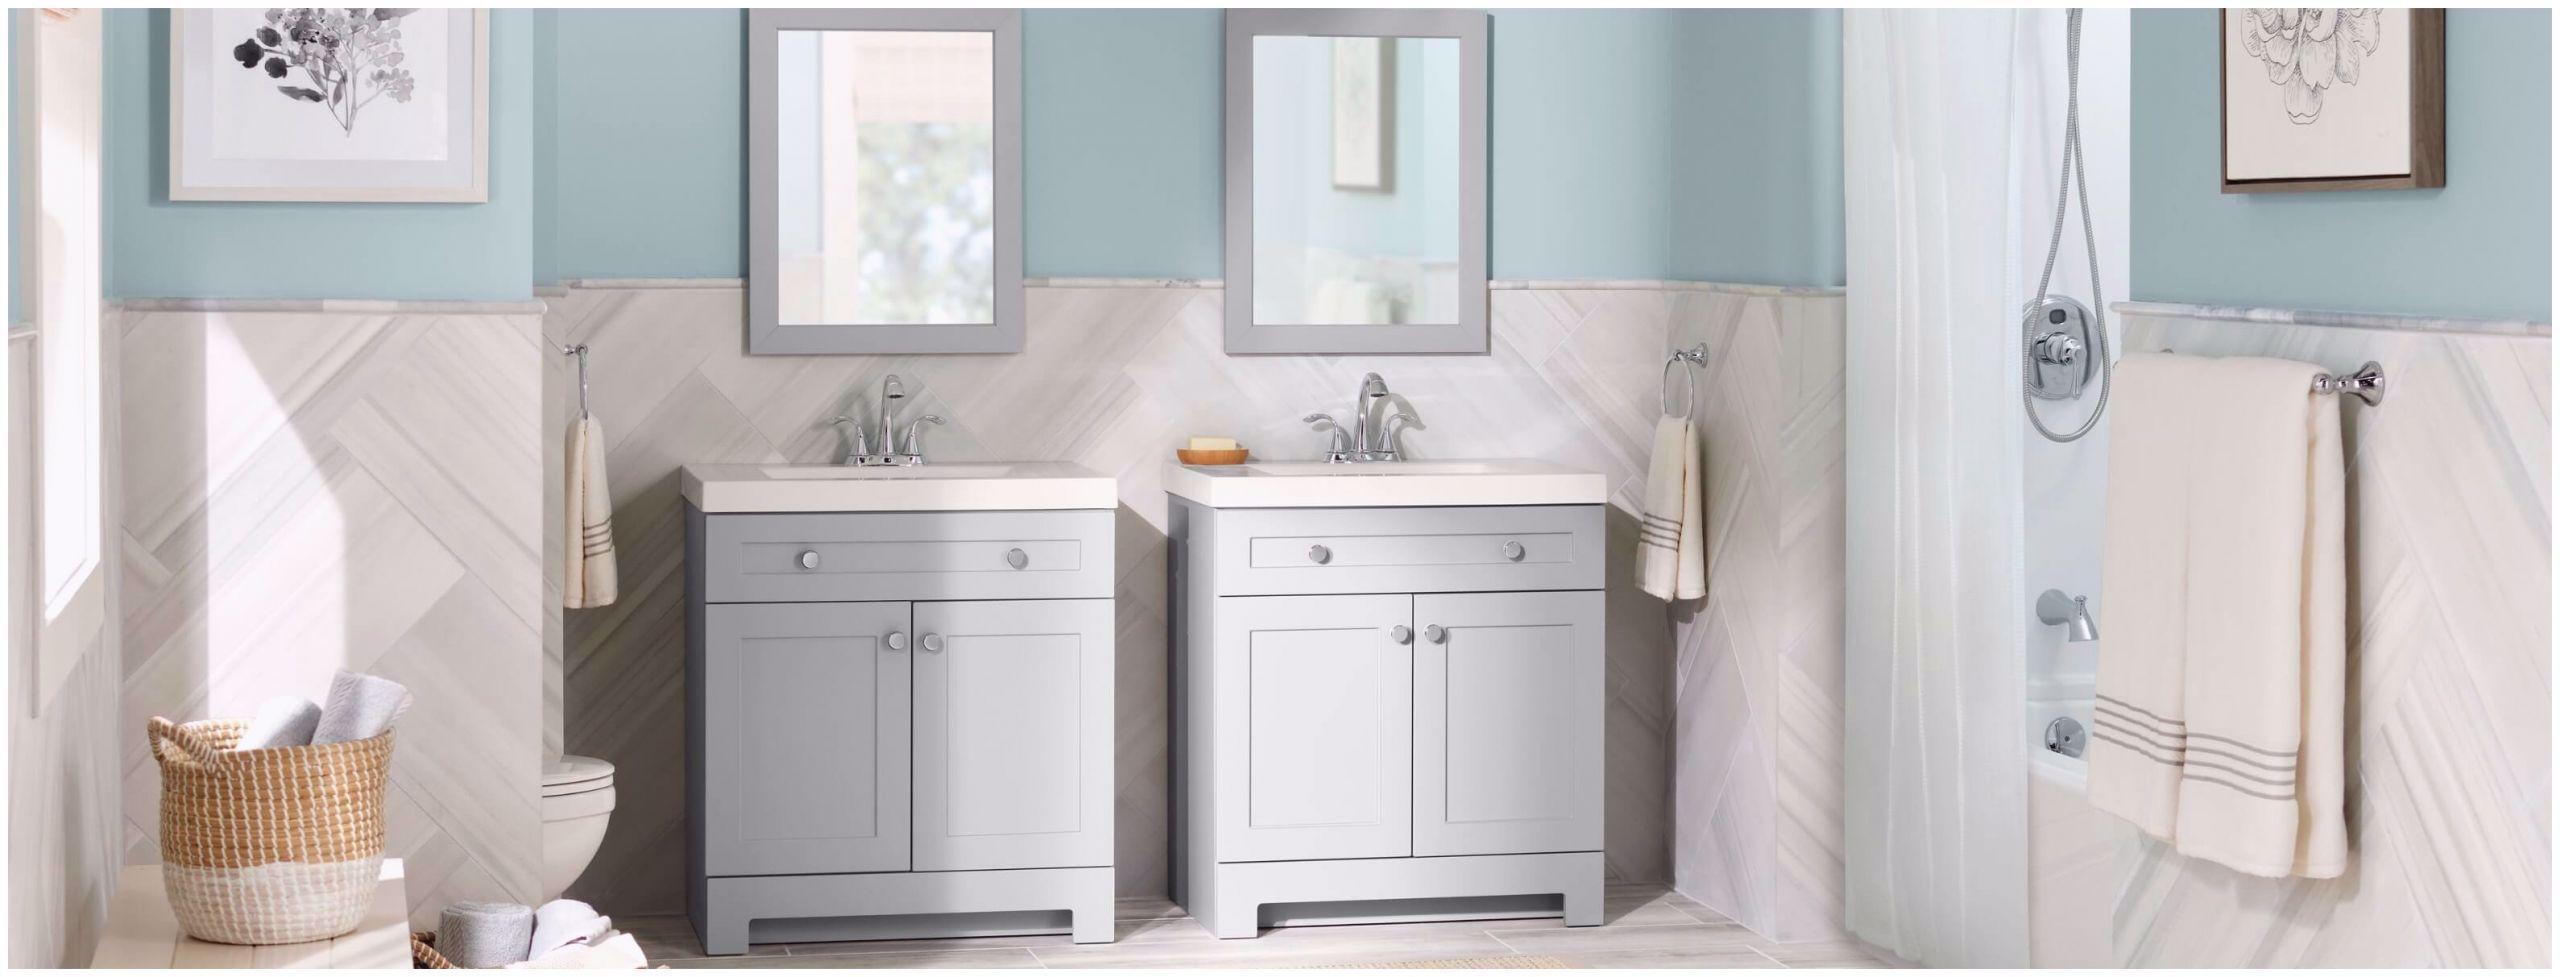 Wbe Hero2 Clearance Bathroom Vanities With Tops Of Bathroom